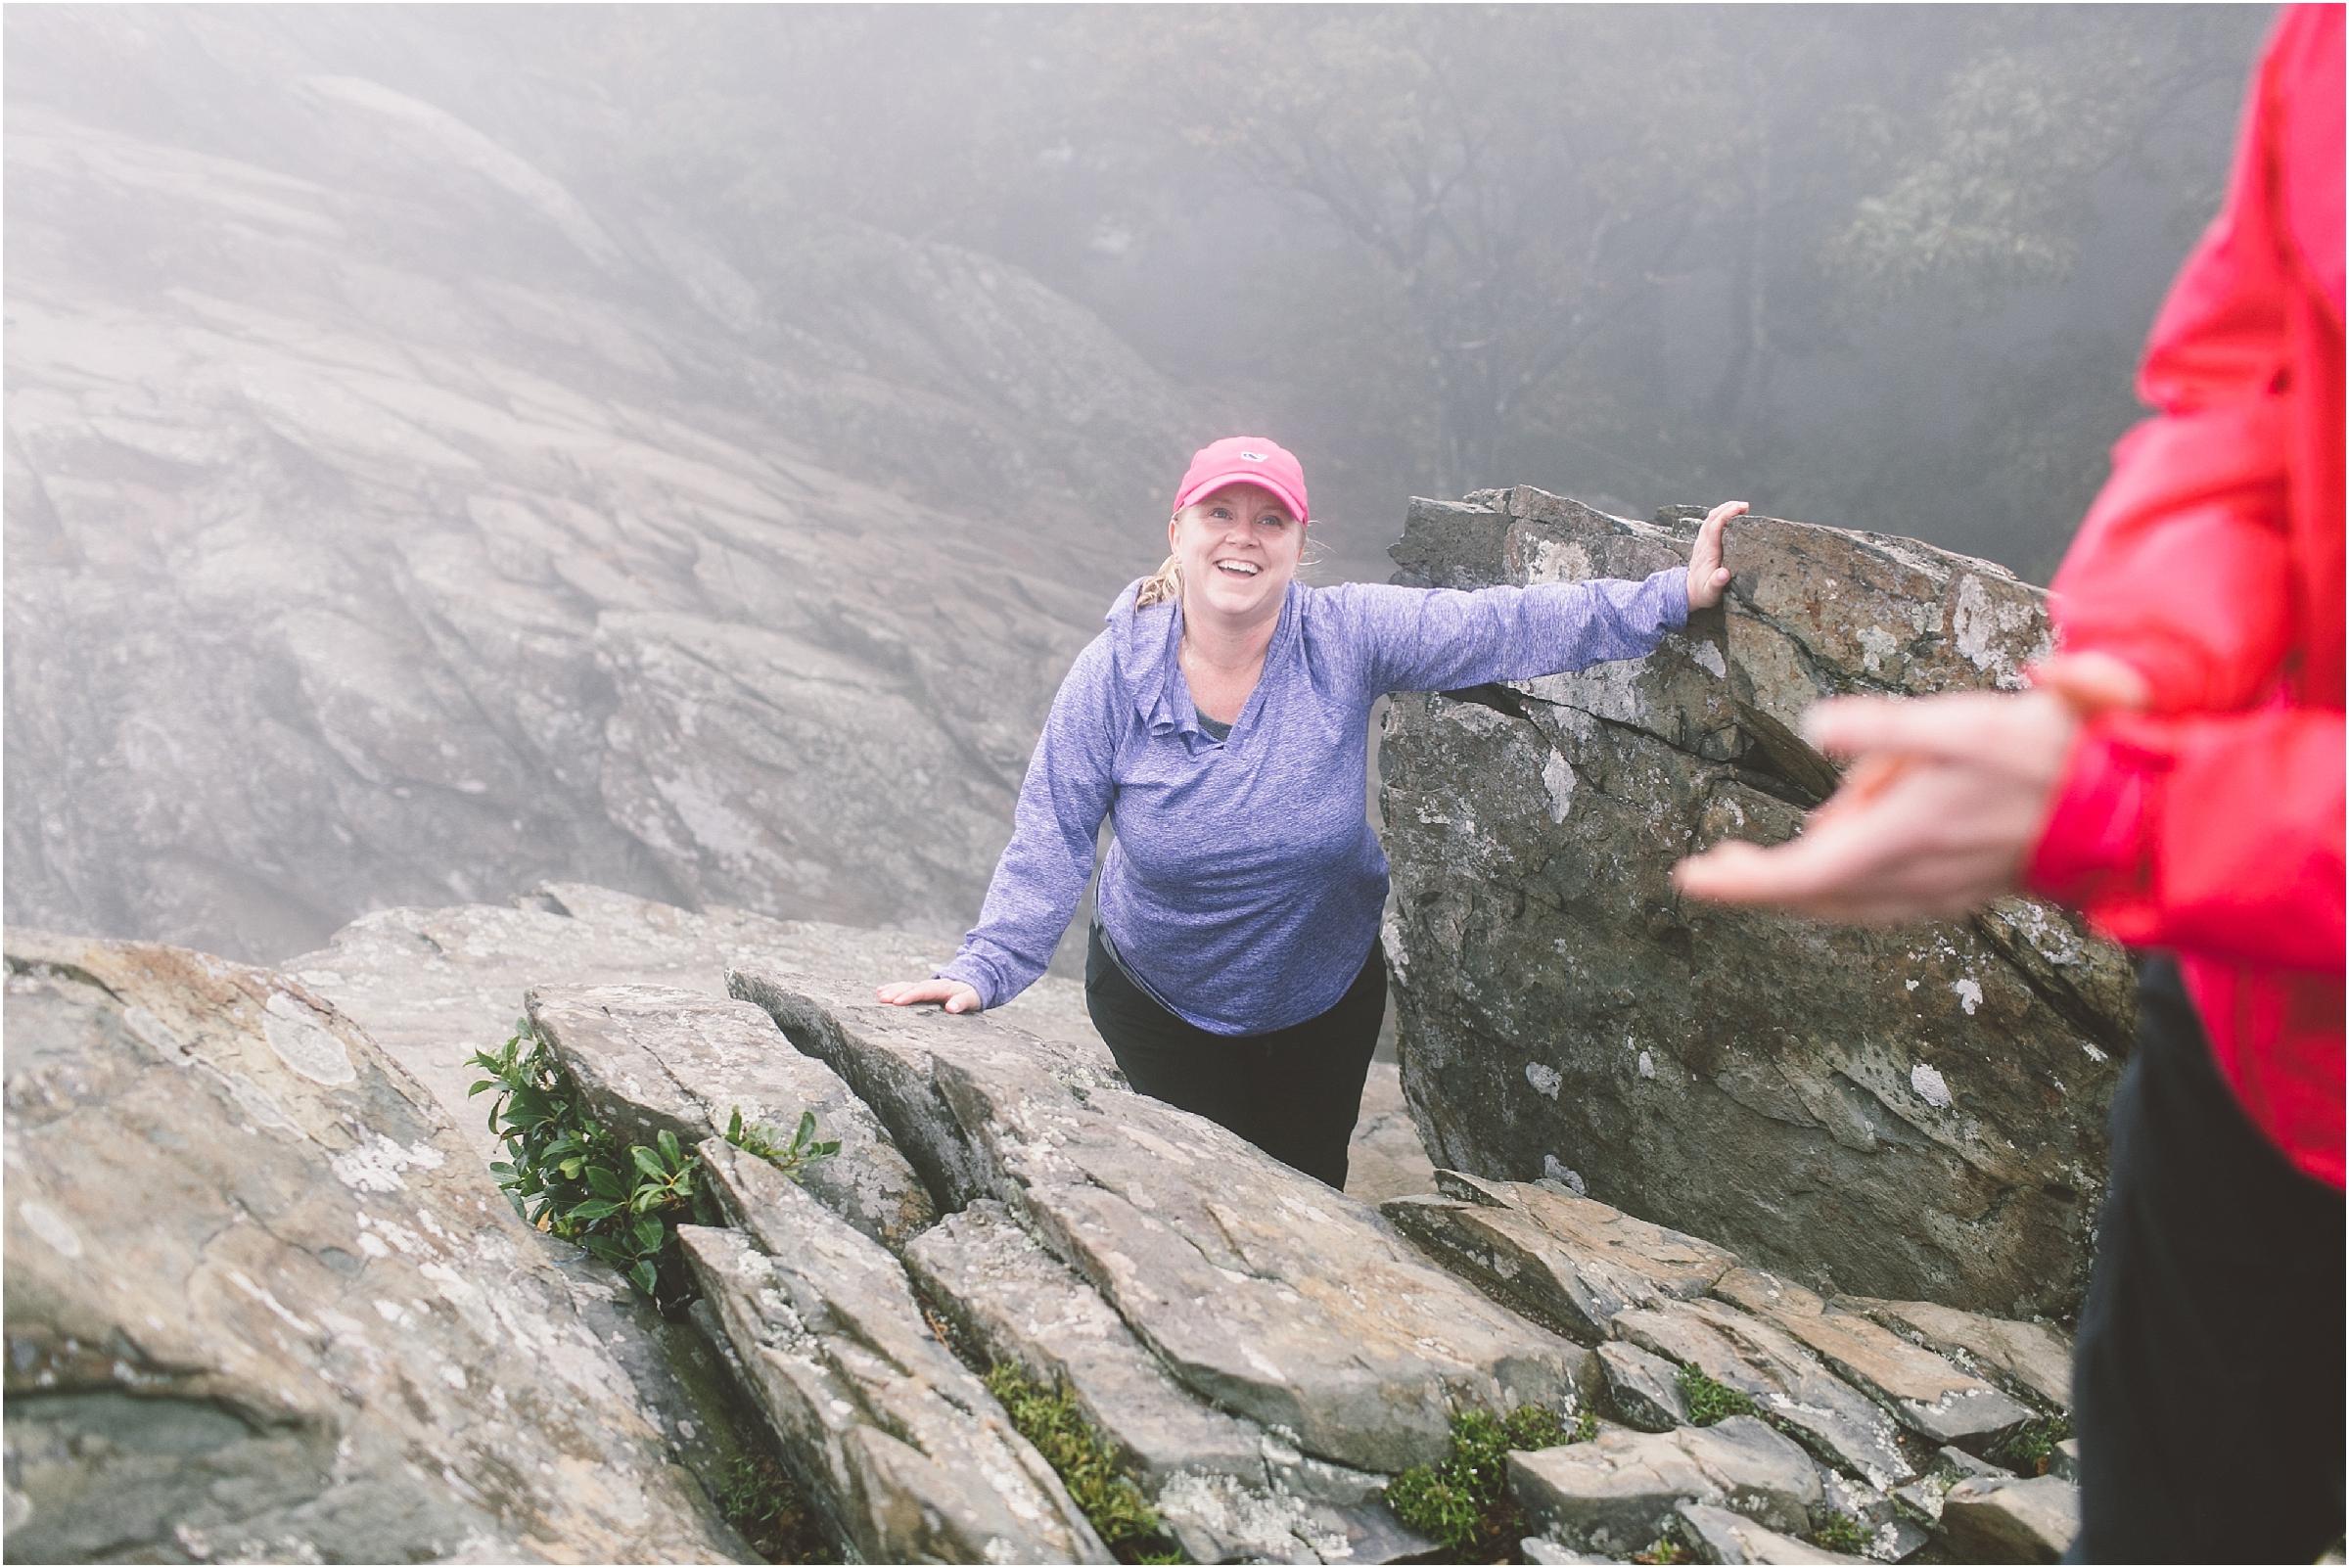 humpback rocks hike women hiking group her hike collective blue ridge parkway